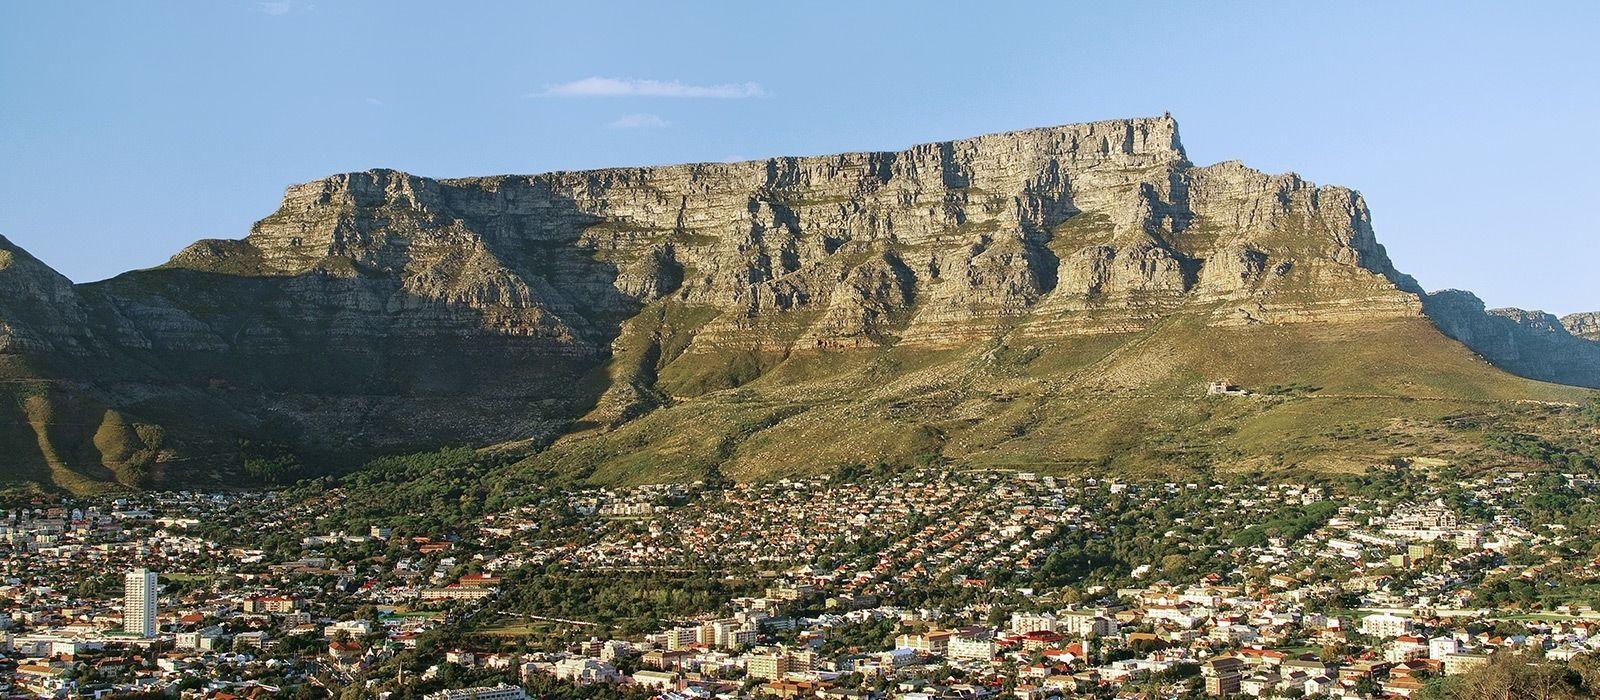 Destination Cape Town South Africa